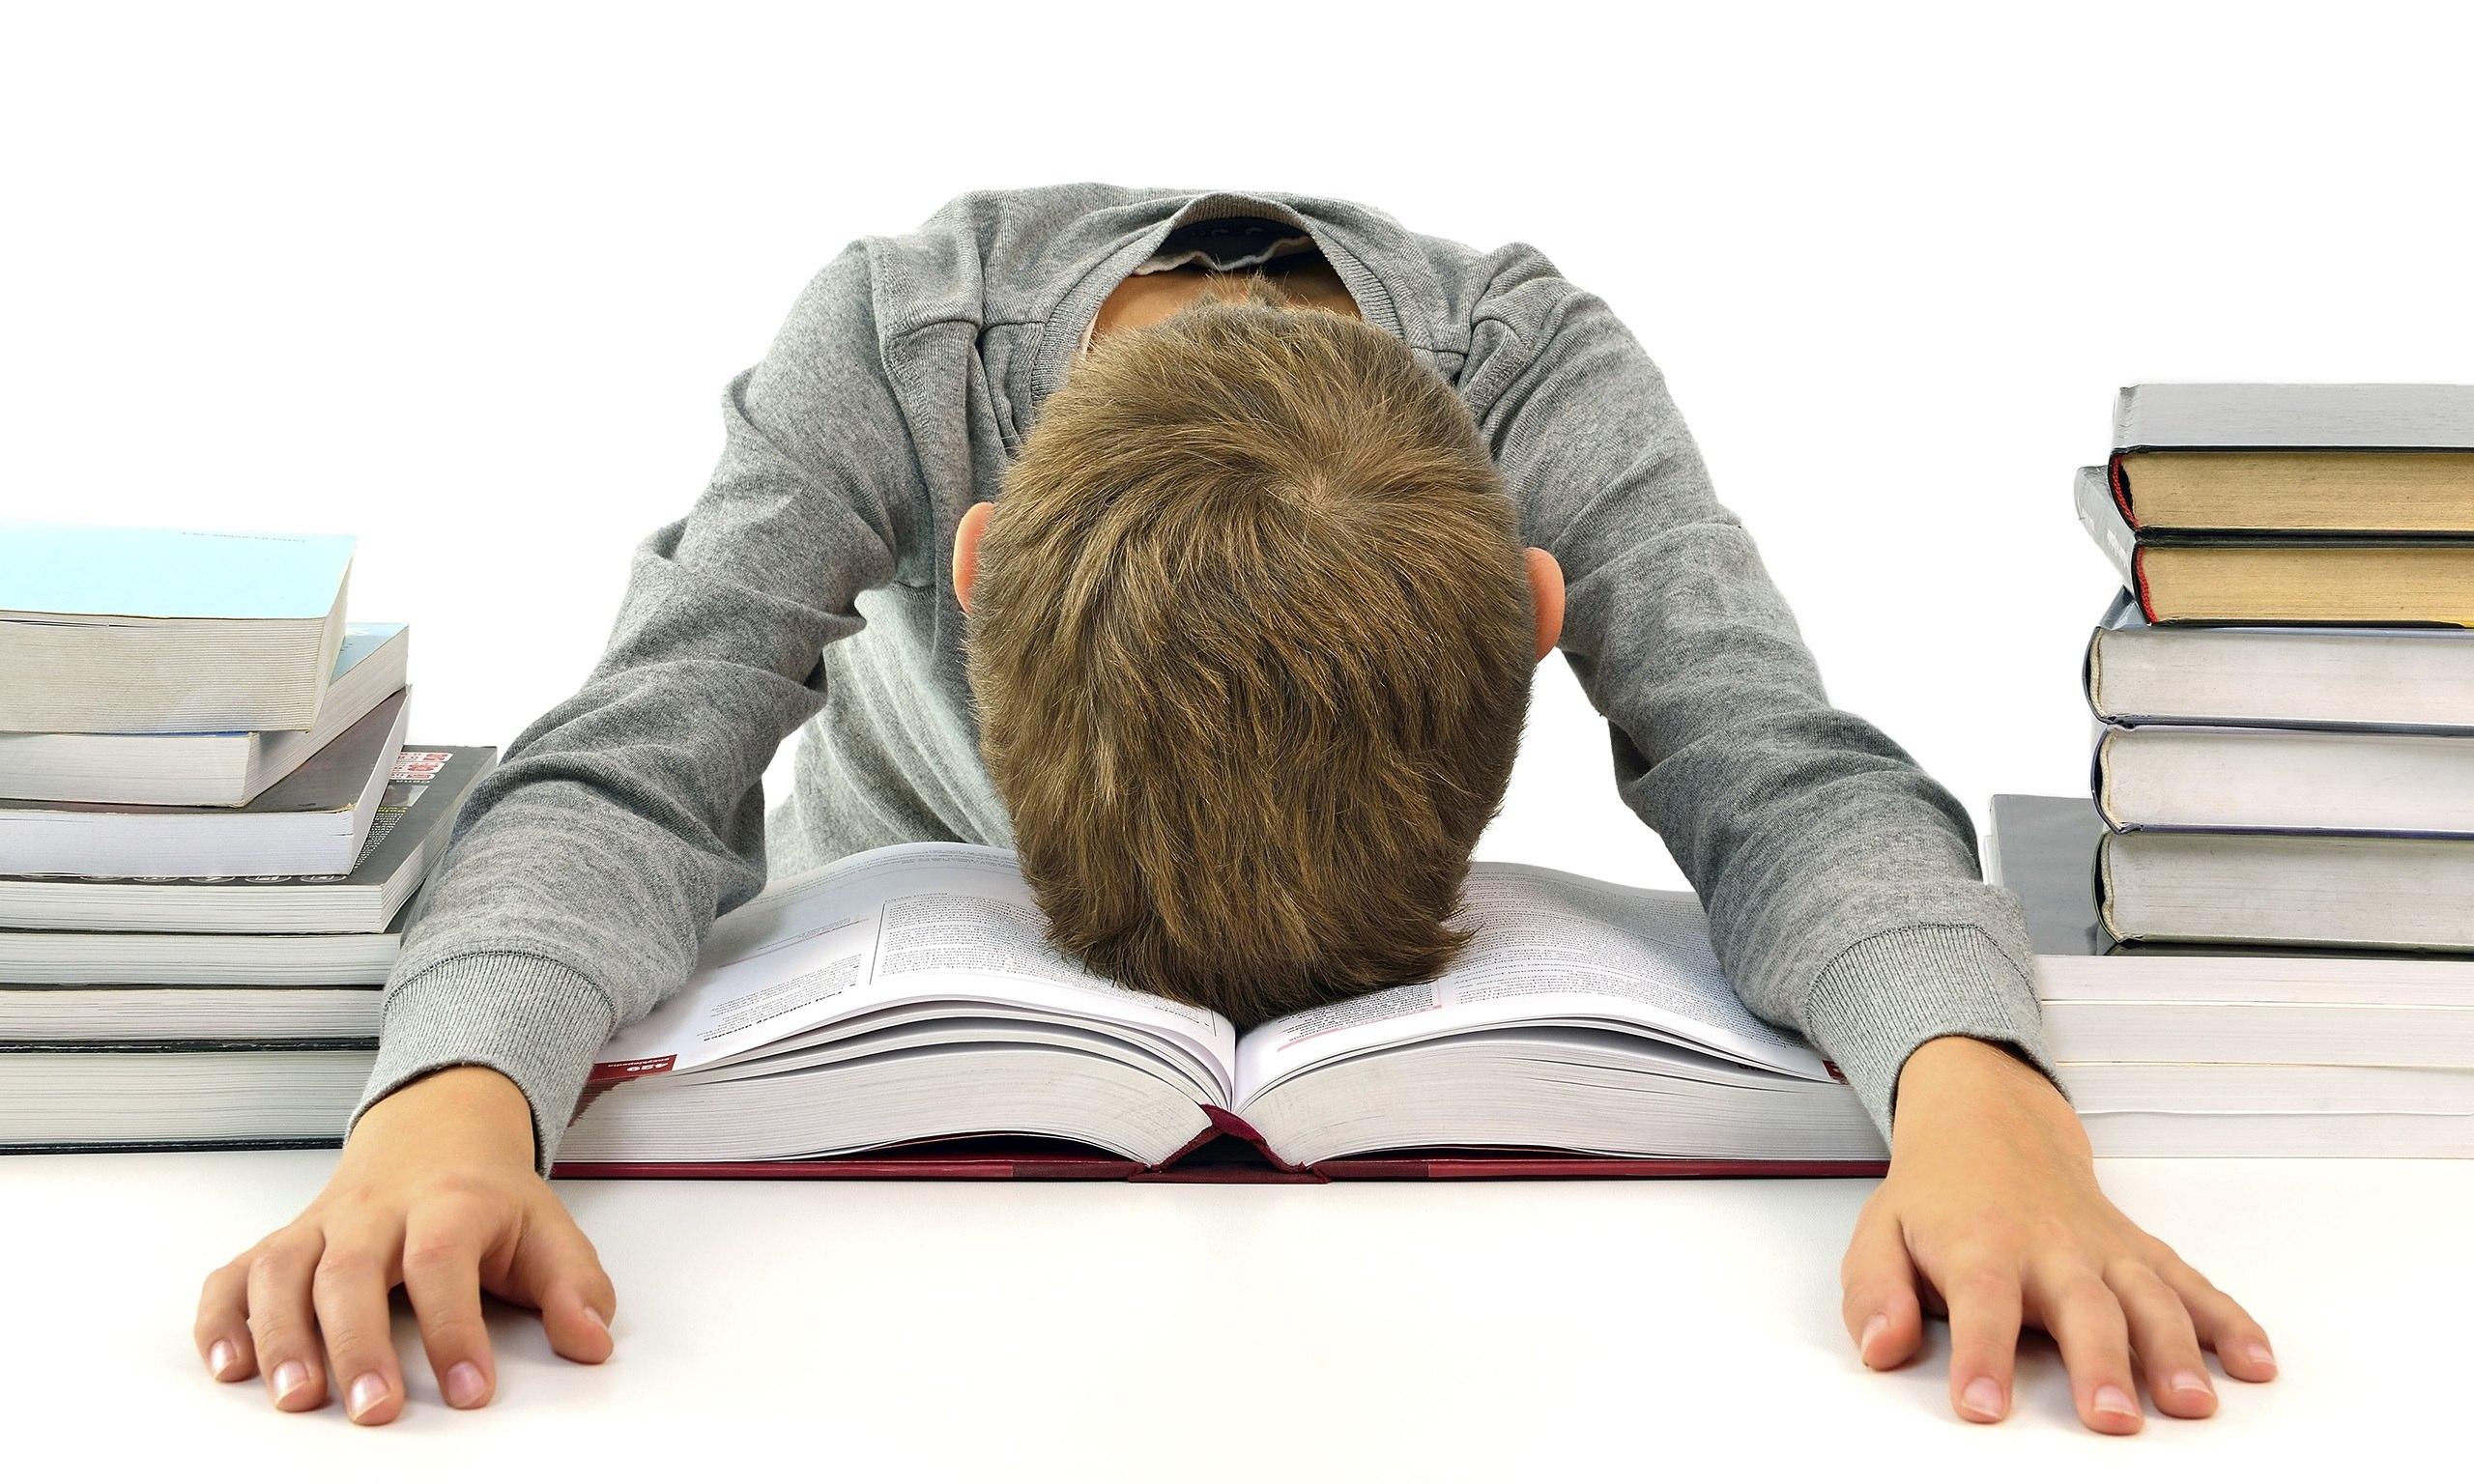 Boy-with-books-014.jpg